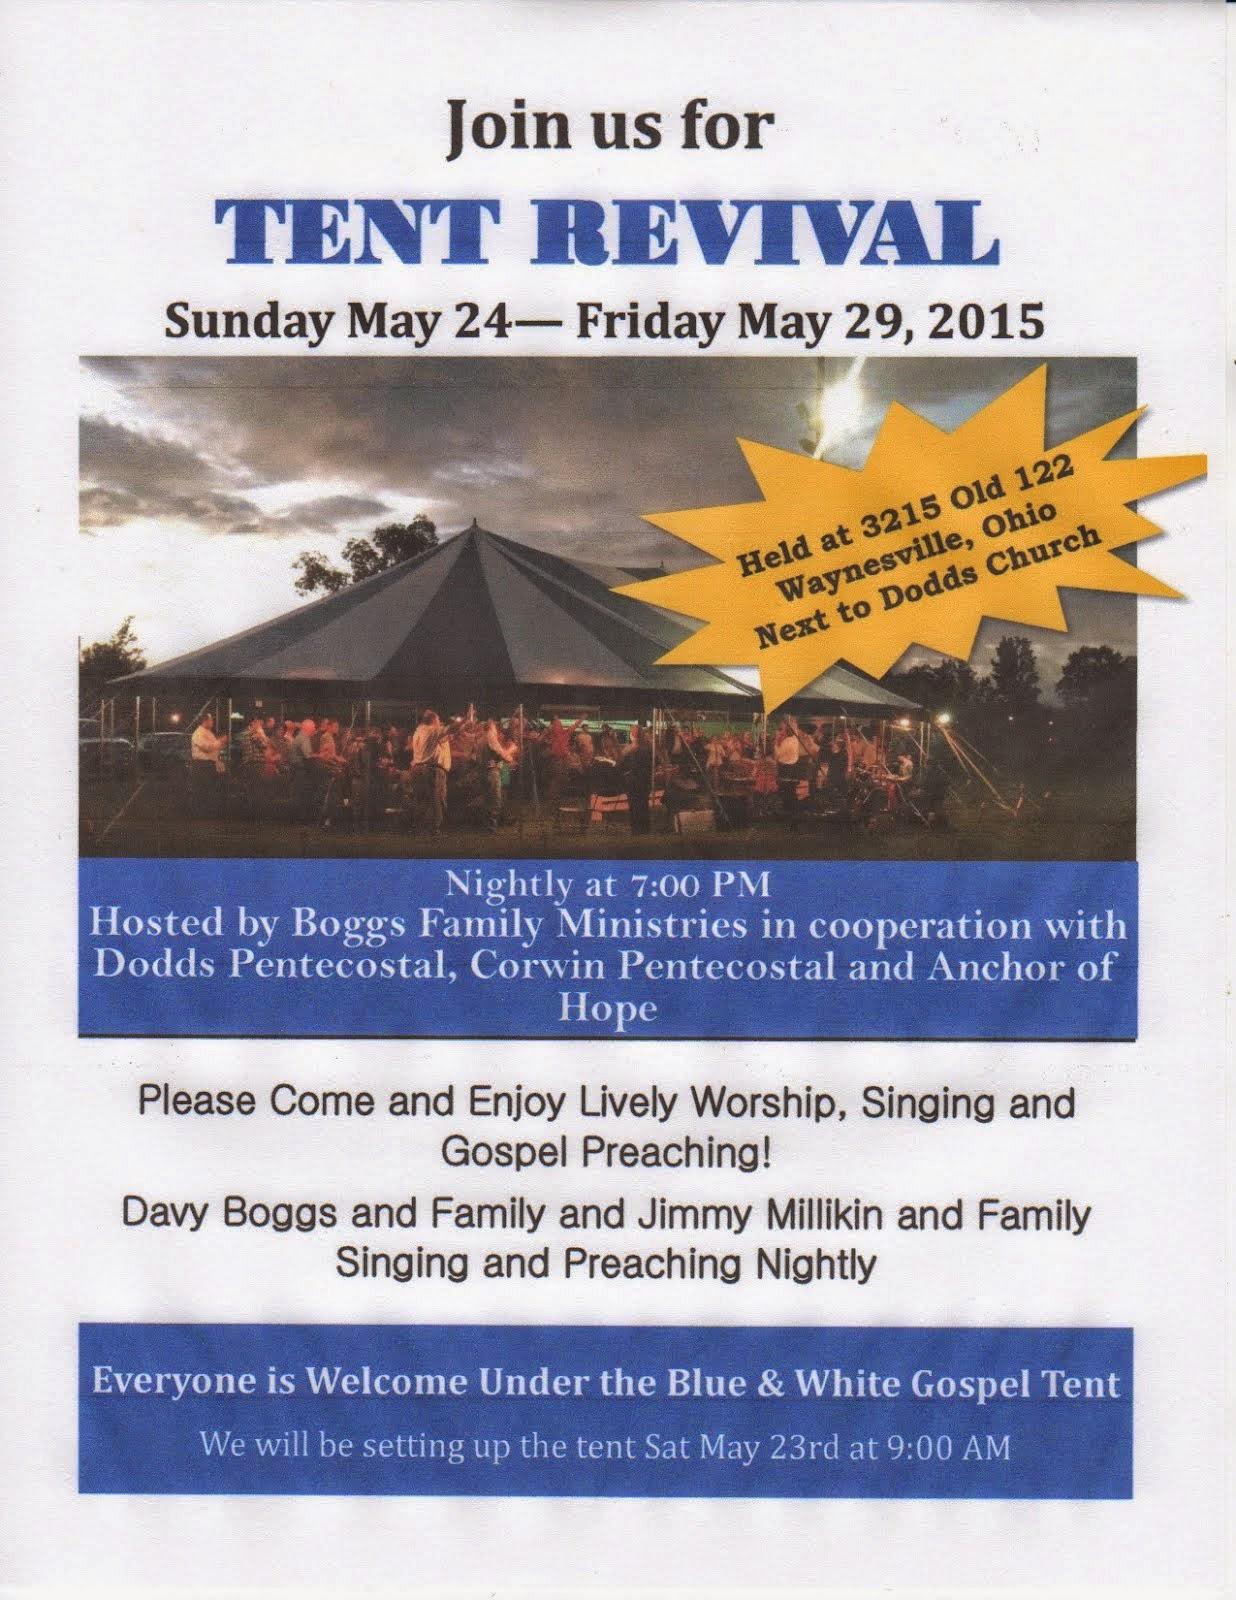 Mile Markers Waynesville Ohio Tent Revival